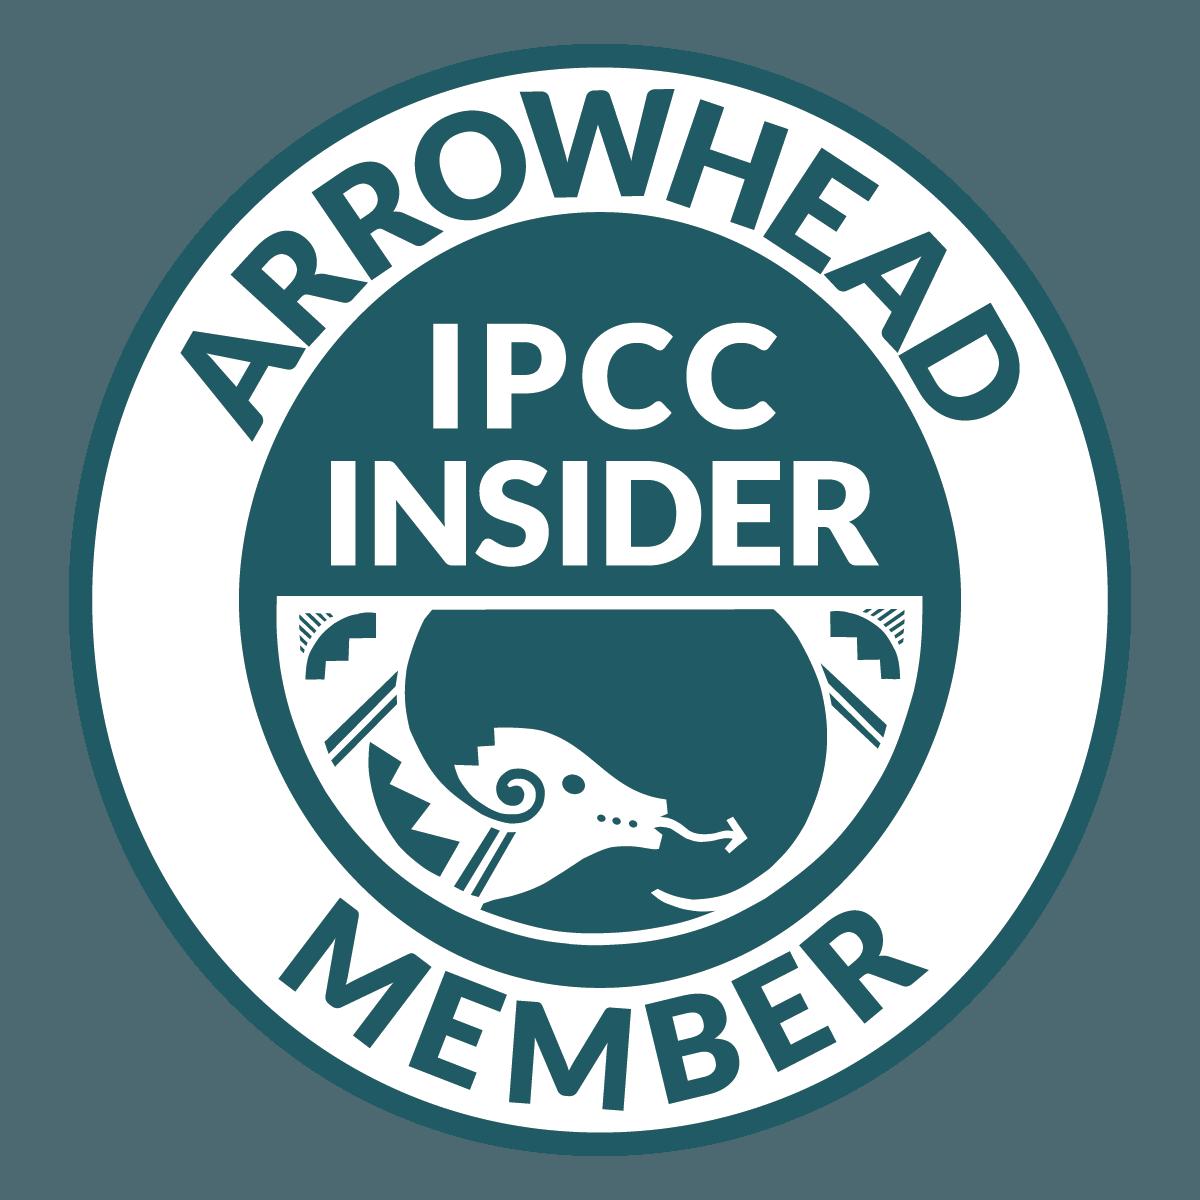 Arrowhead Indian Pueblo Cultural Center Membership Level